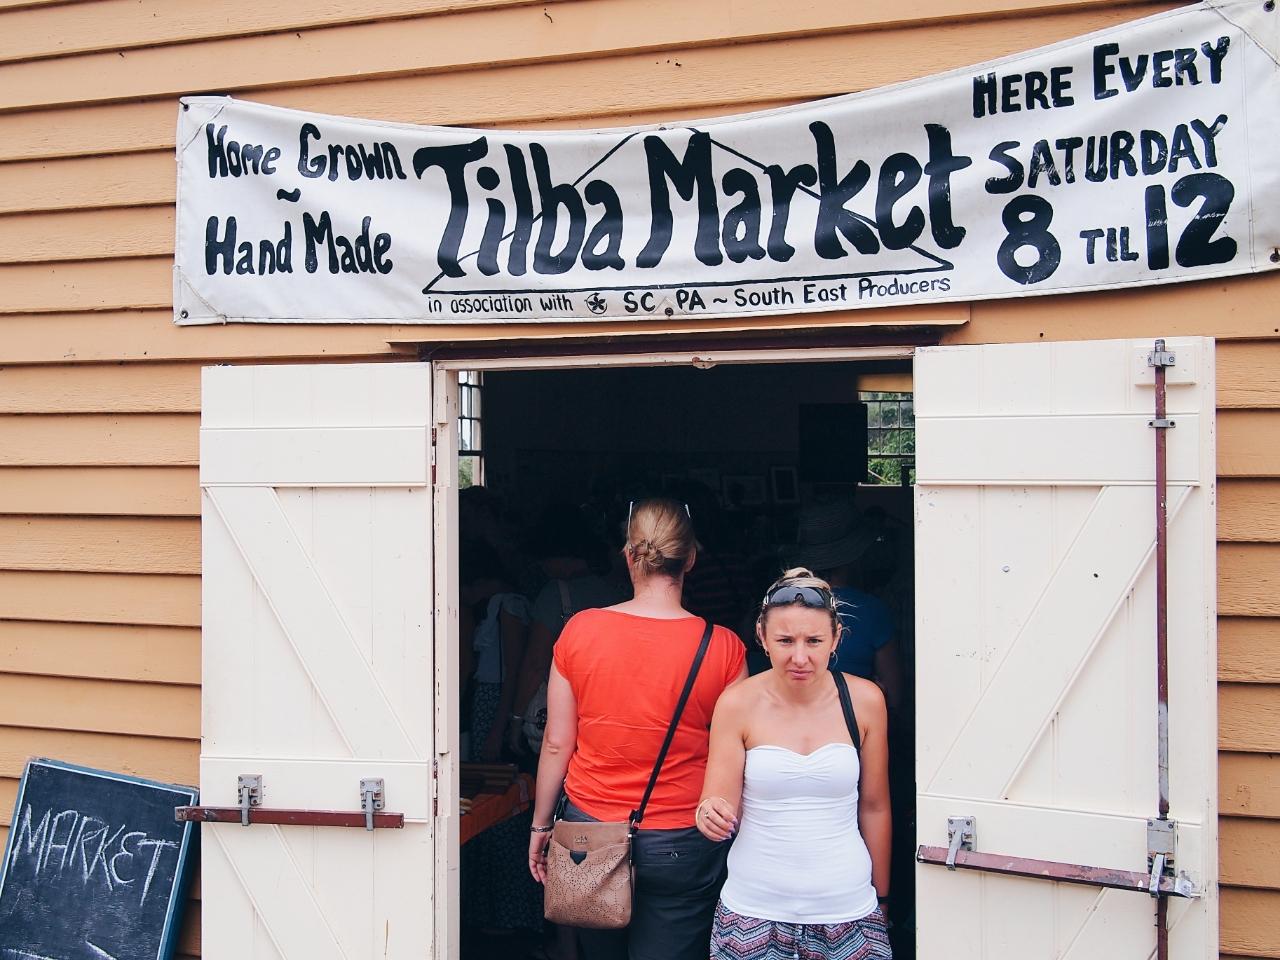 The_Food_Avenue_Tilba6